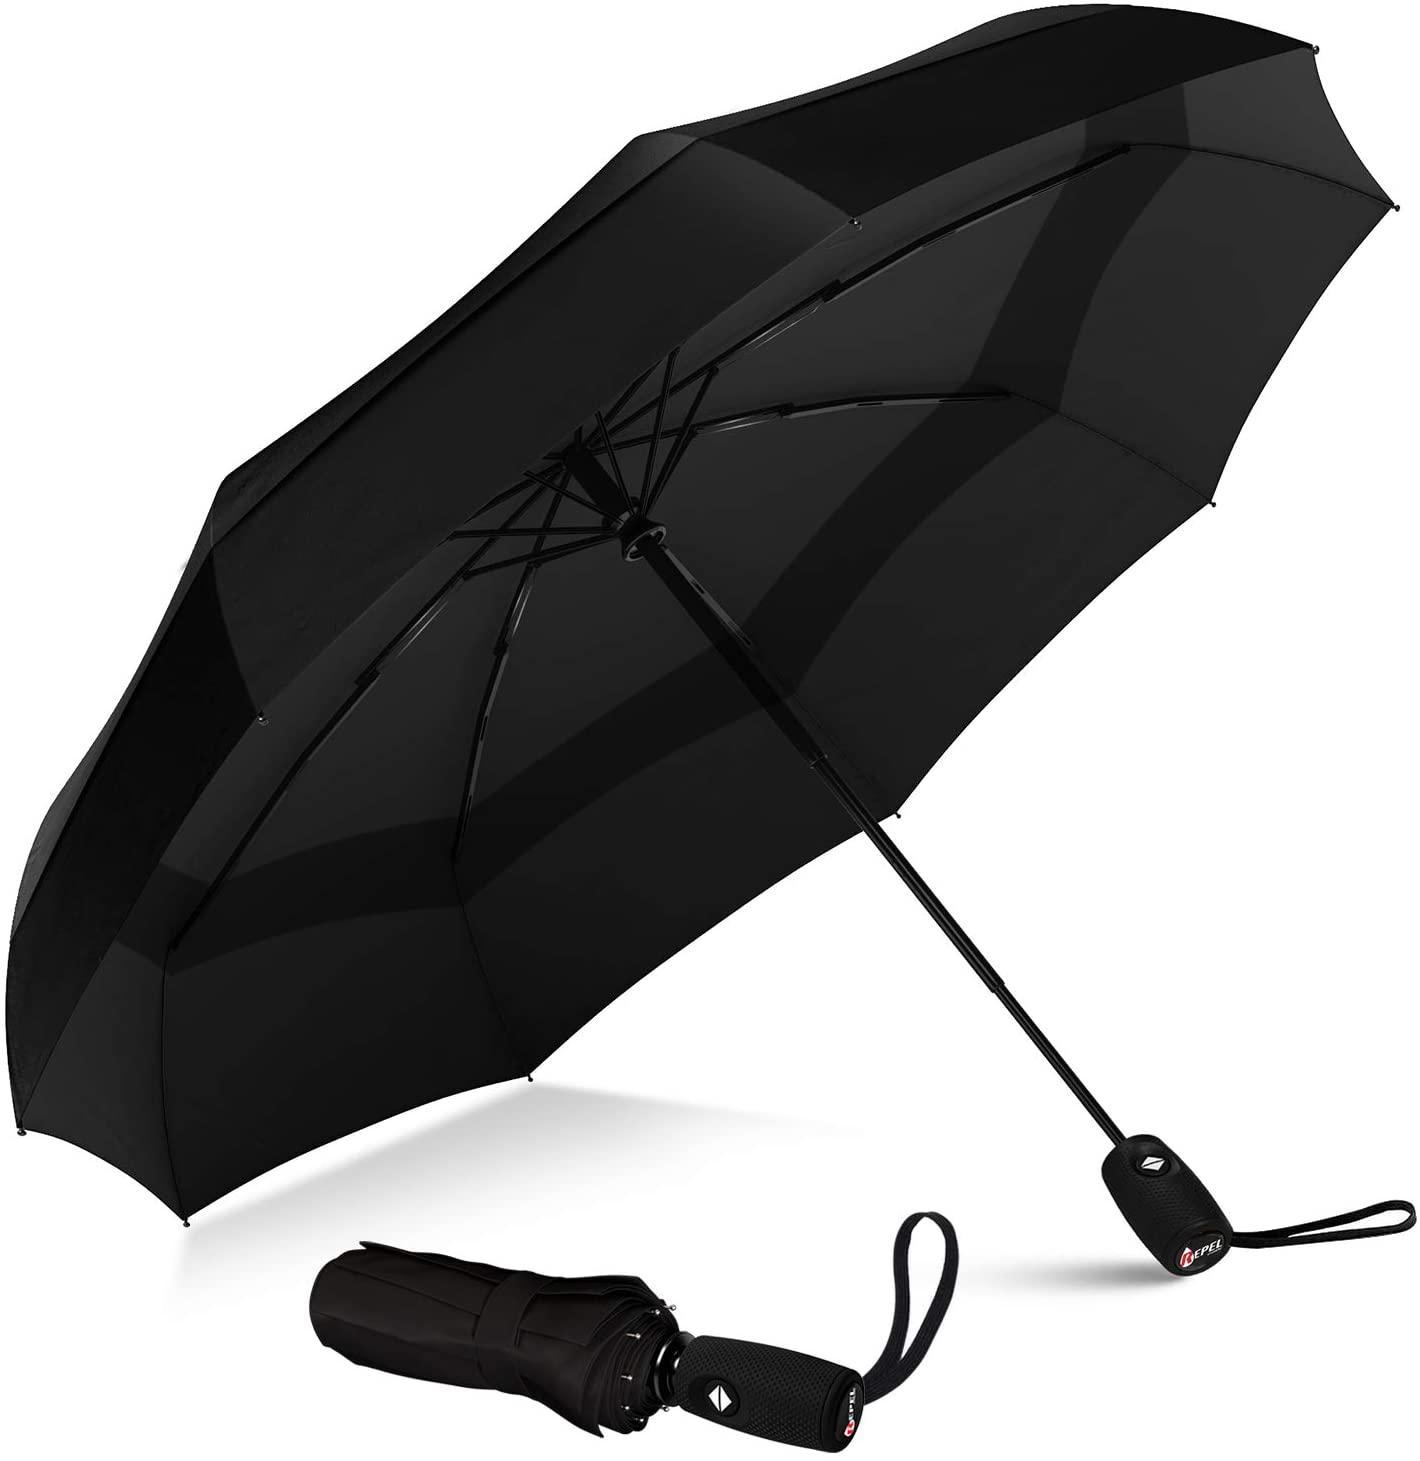 Repel Travel Umbrella with Coating